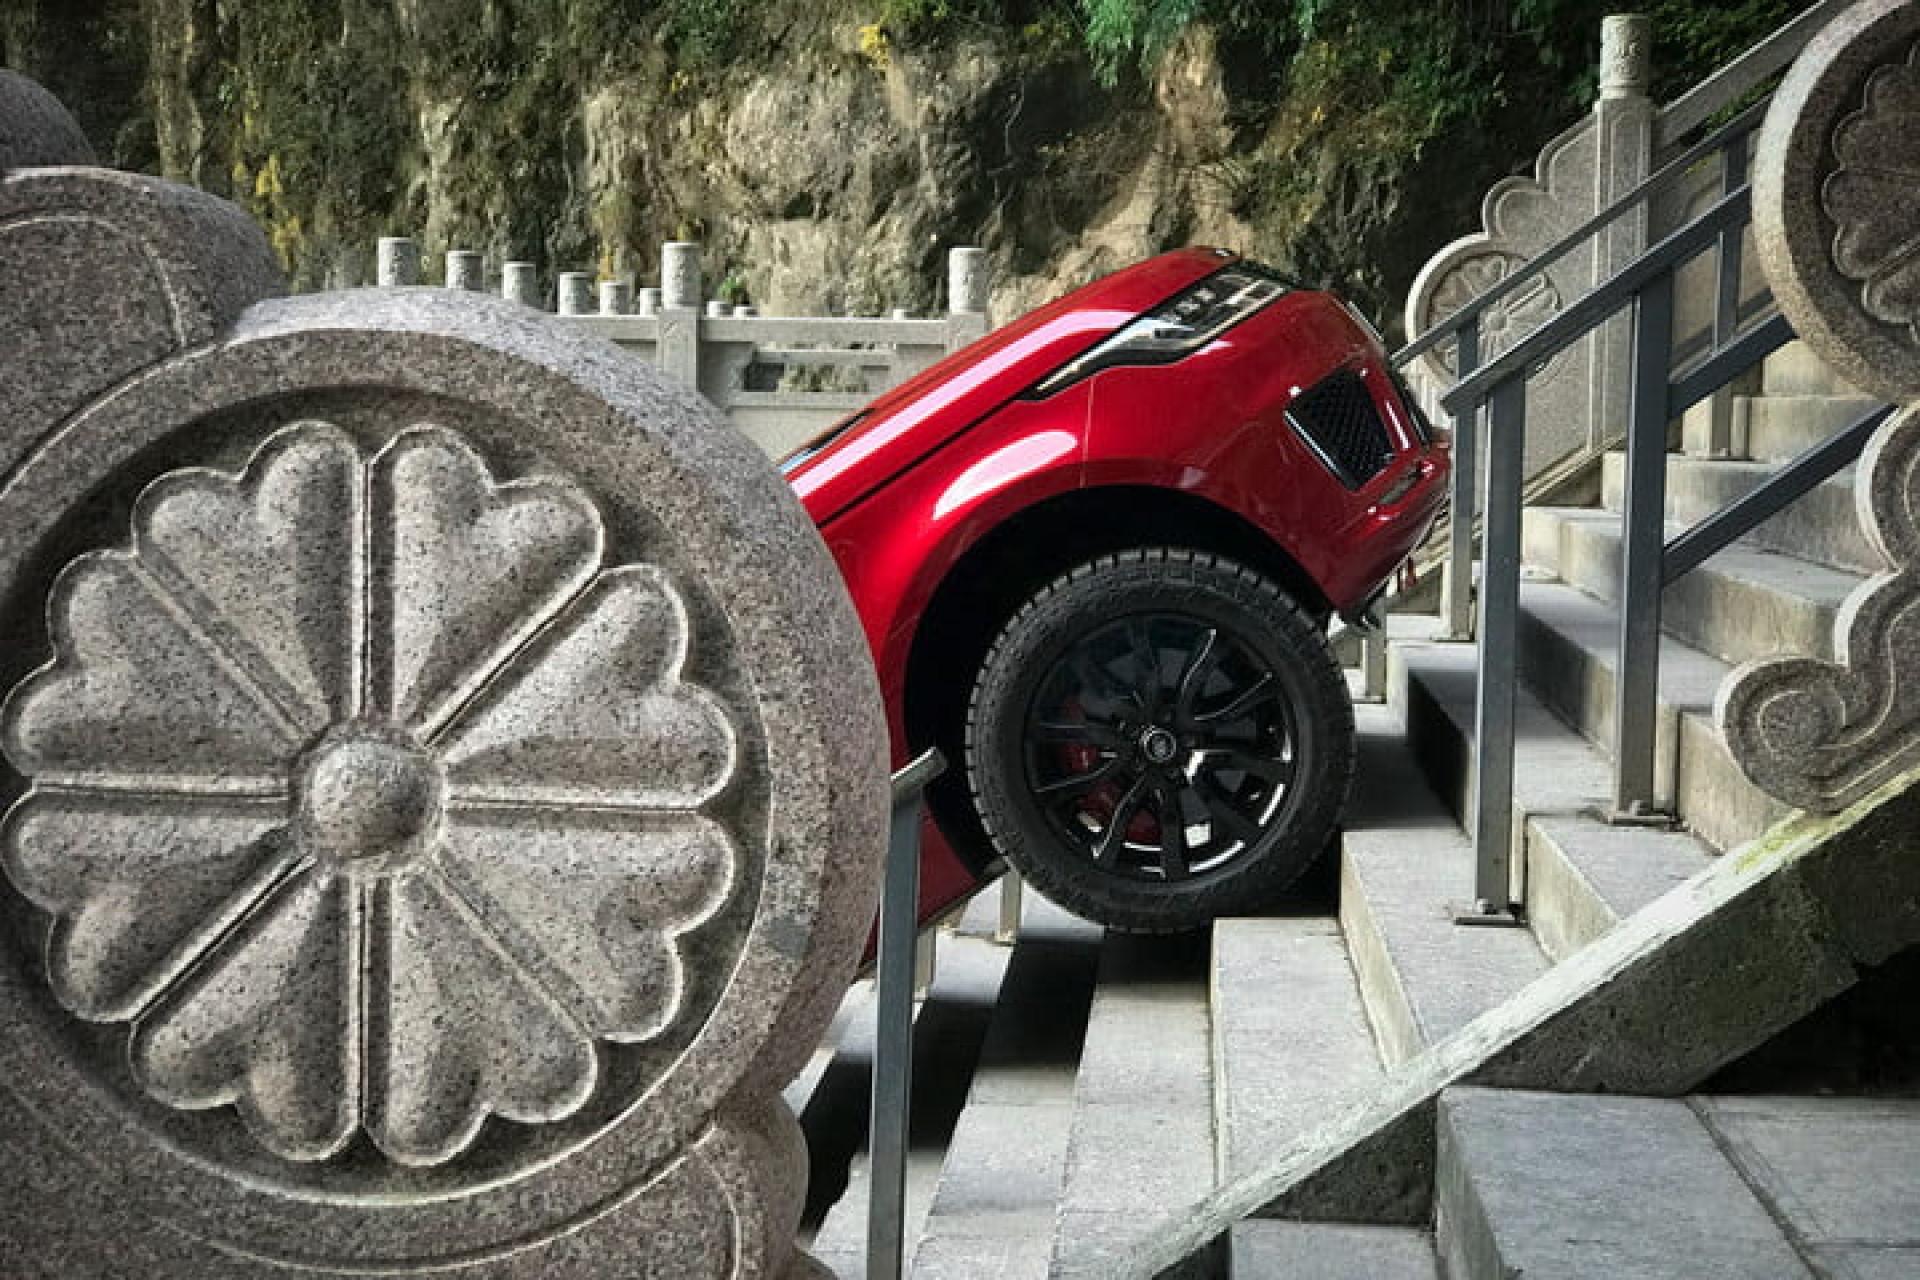 Land Rover híbrido subiu a 'escadaria para o céu'